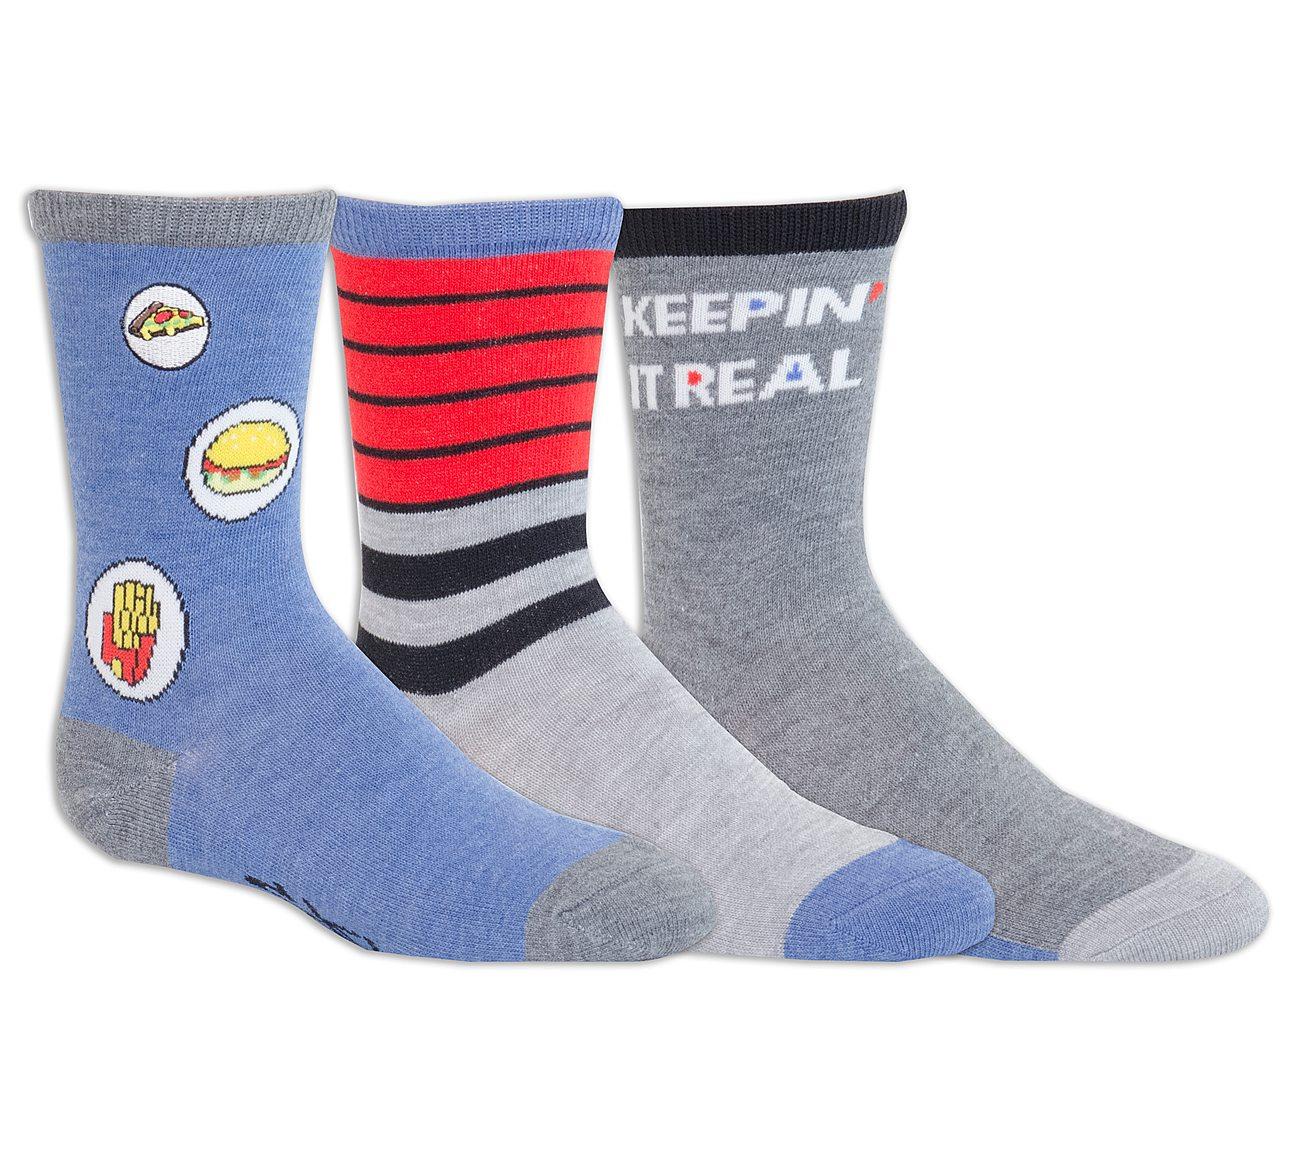 3 Pack Cool Crew Socks